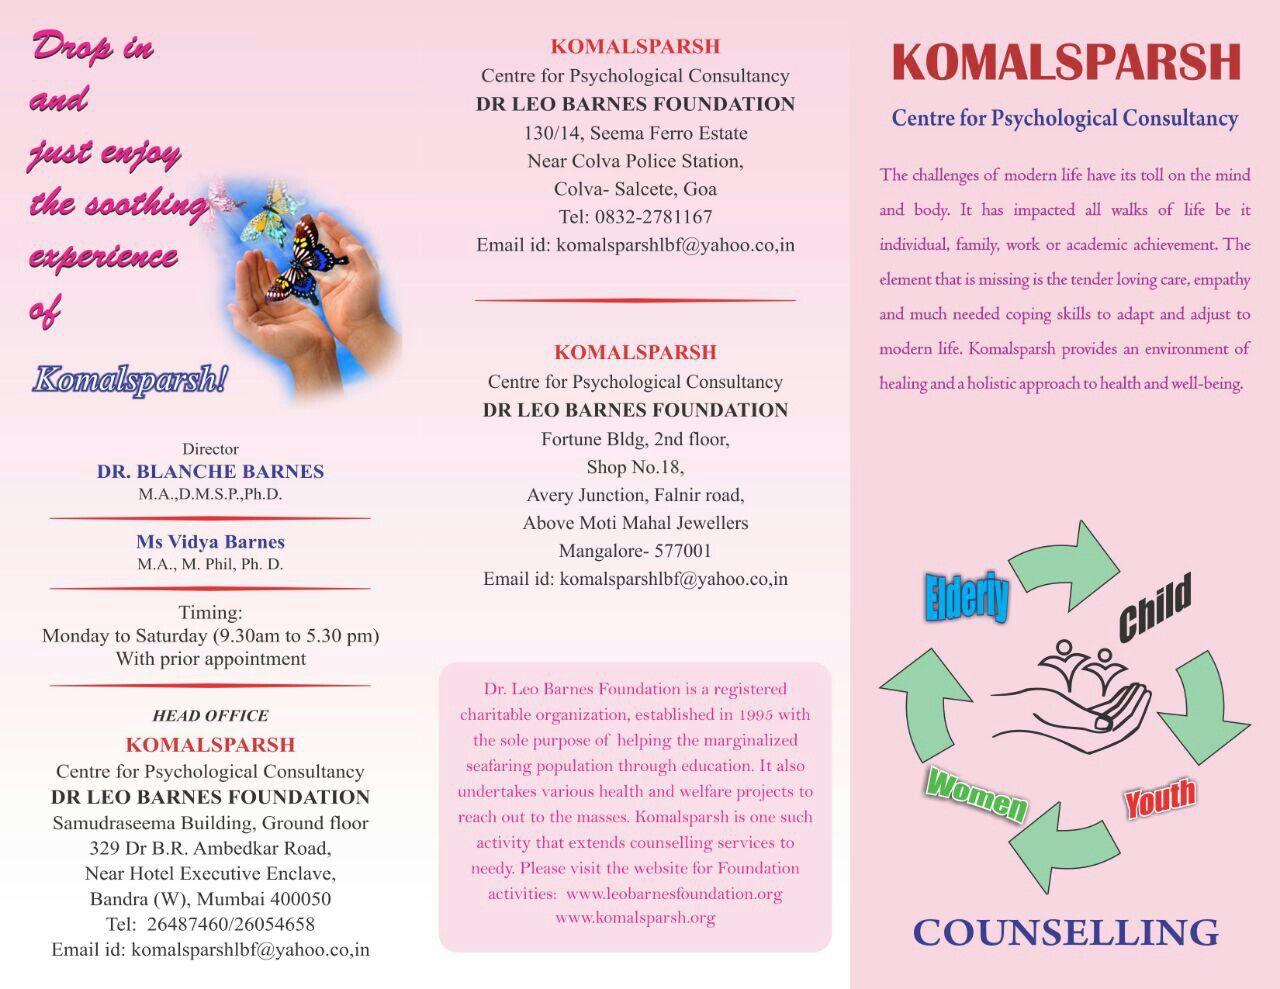 Pin By Komalsparsh Centre For Psychol On Komalsparsh Org Barnes Foundation Psychology Modern Life